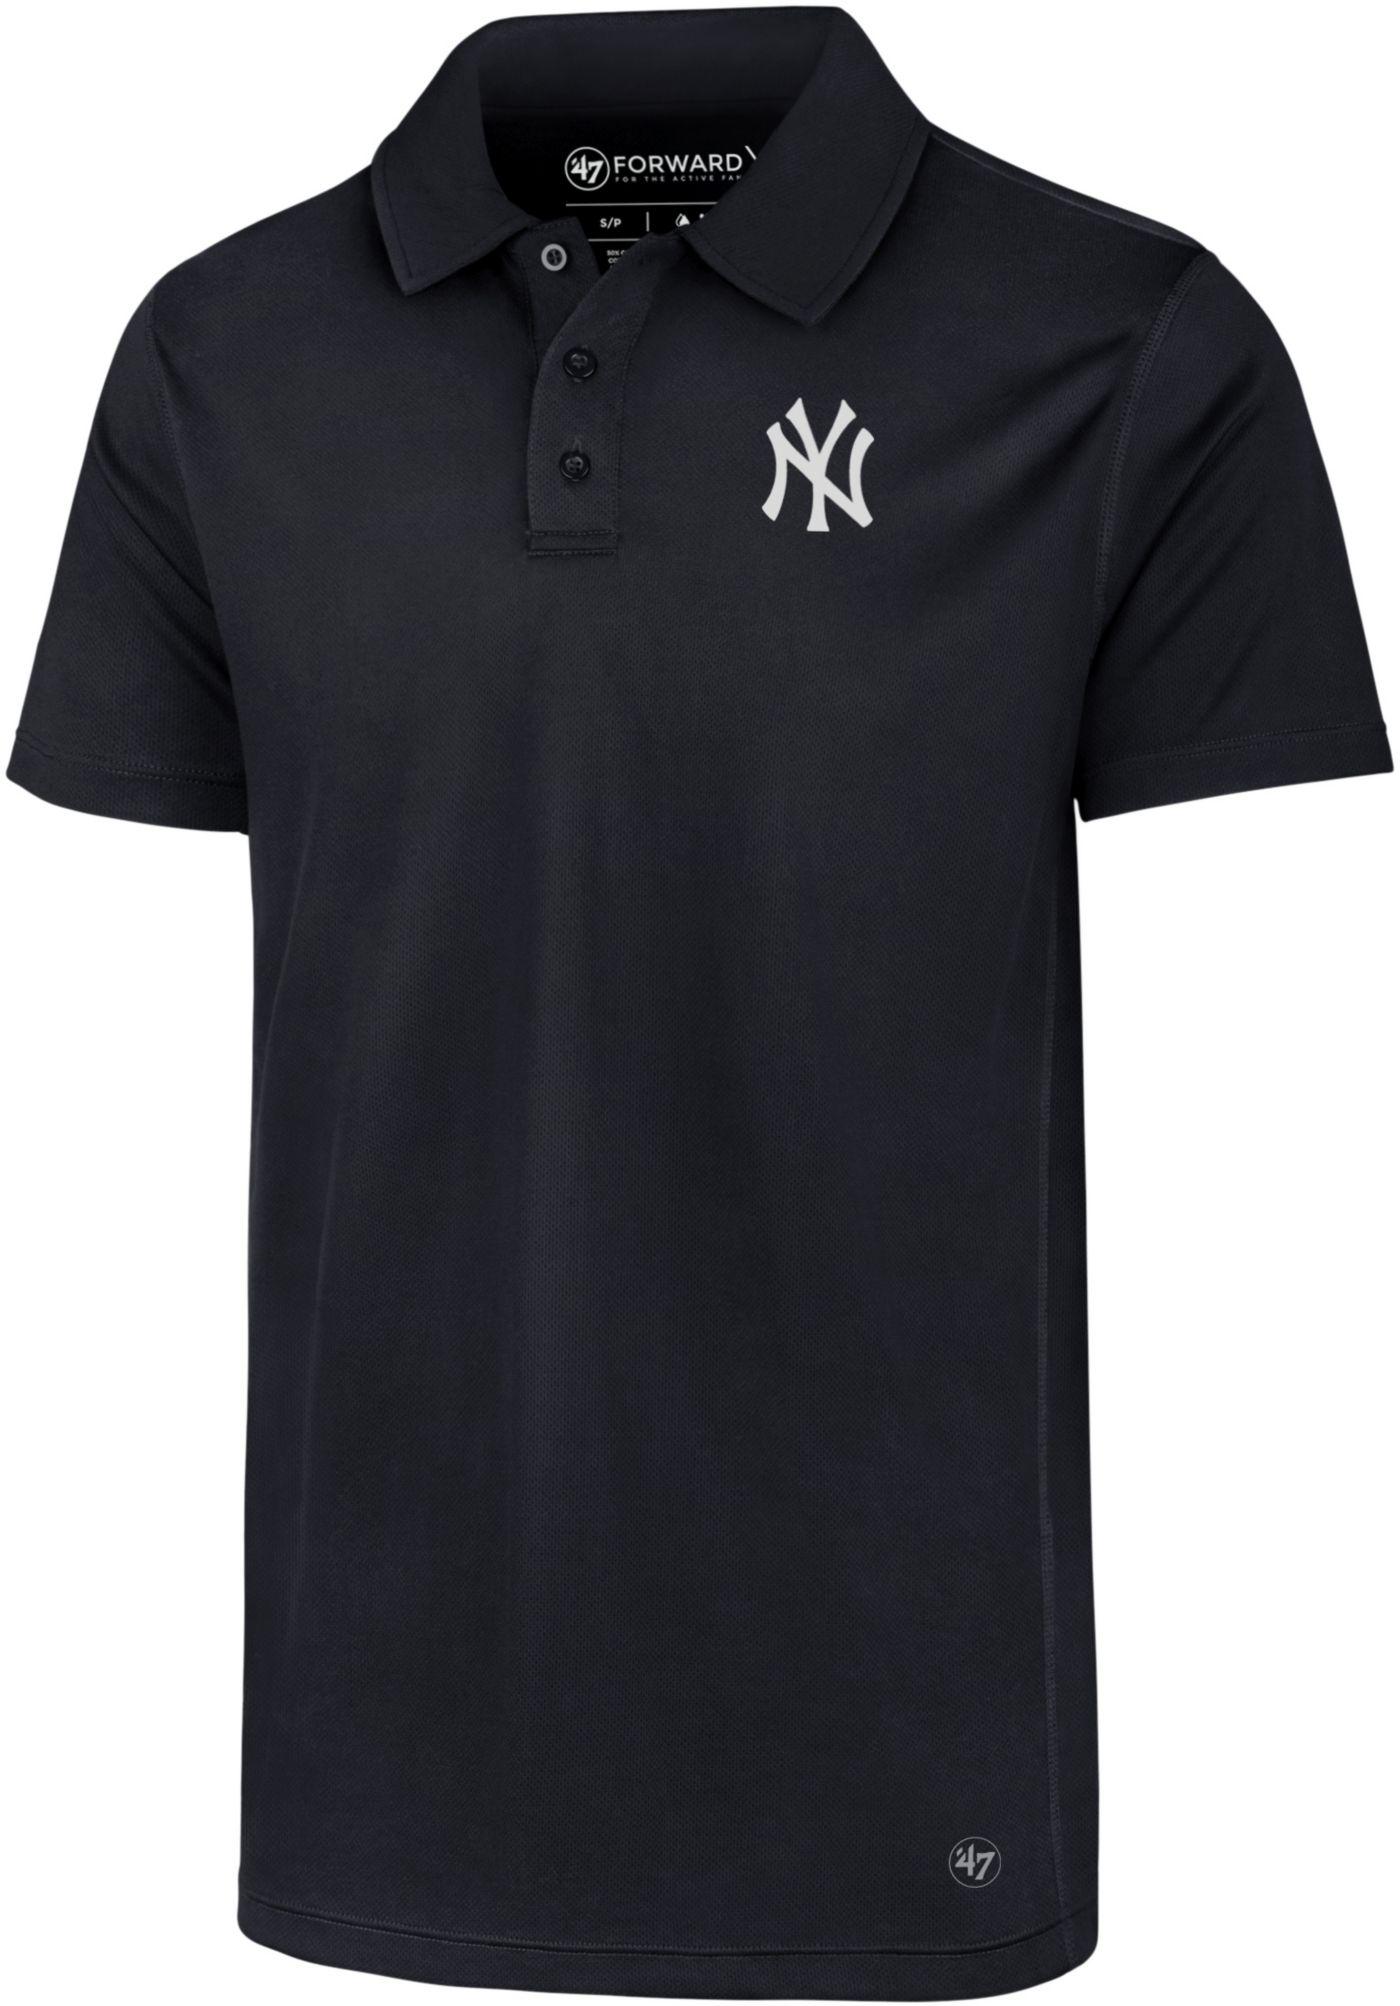 '47 Men's New York Yankees Ace Performance Polo